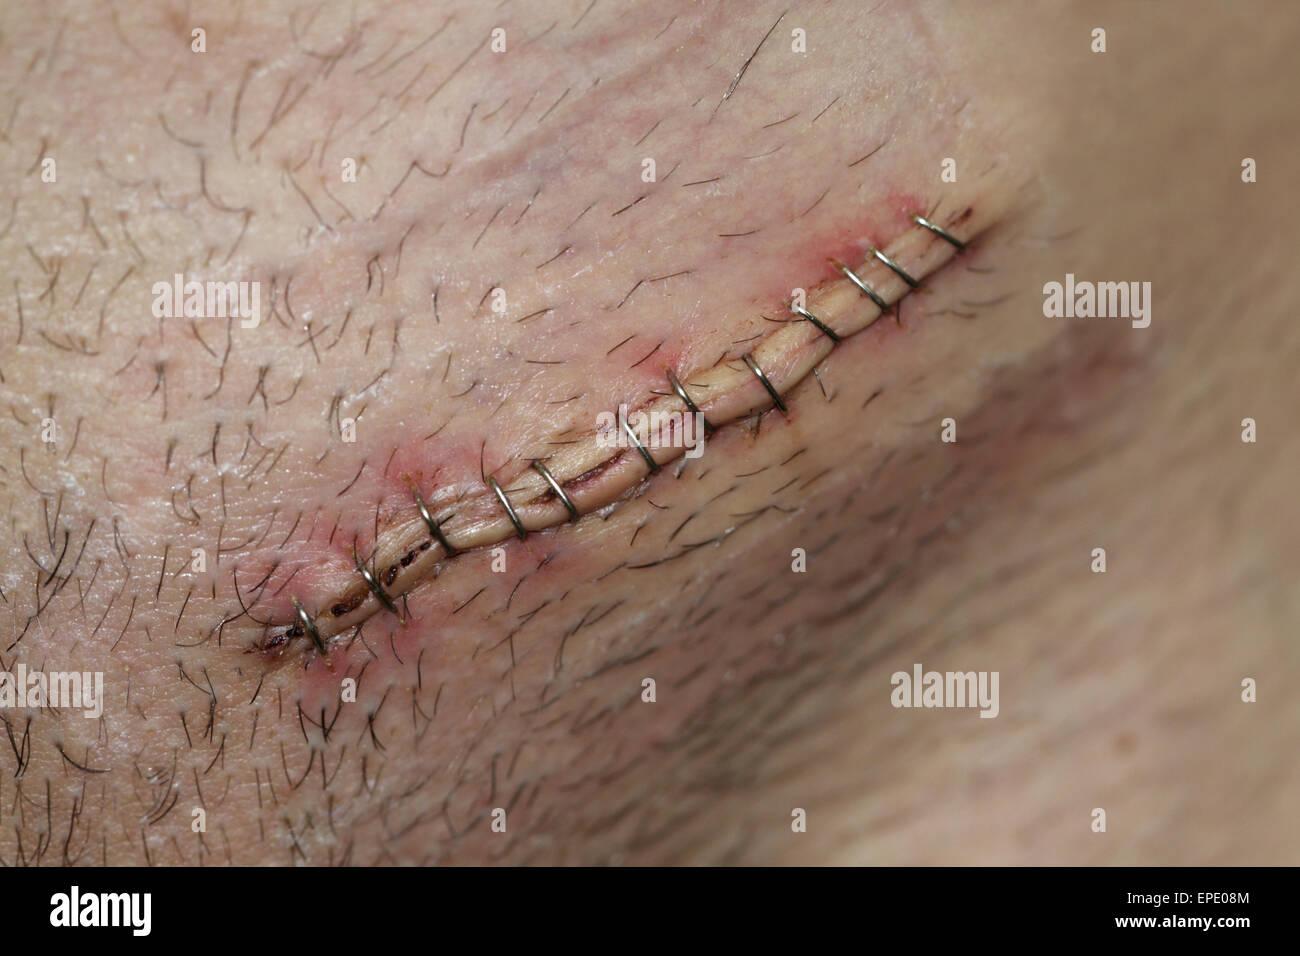 Postoperative inguinal hernia surgical incision - Stock Image